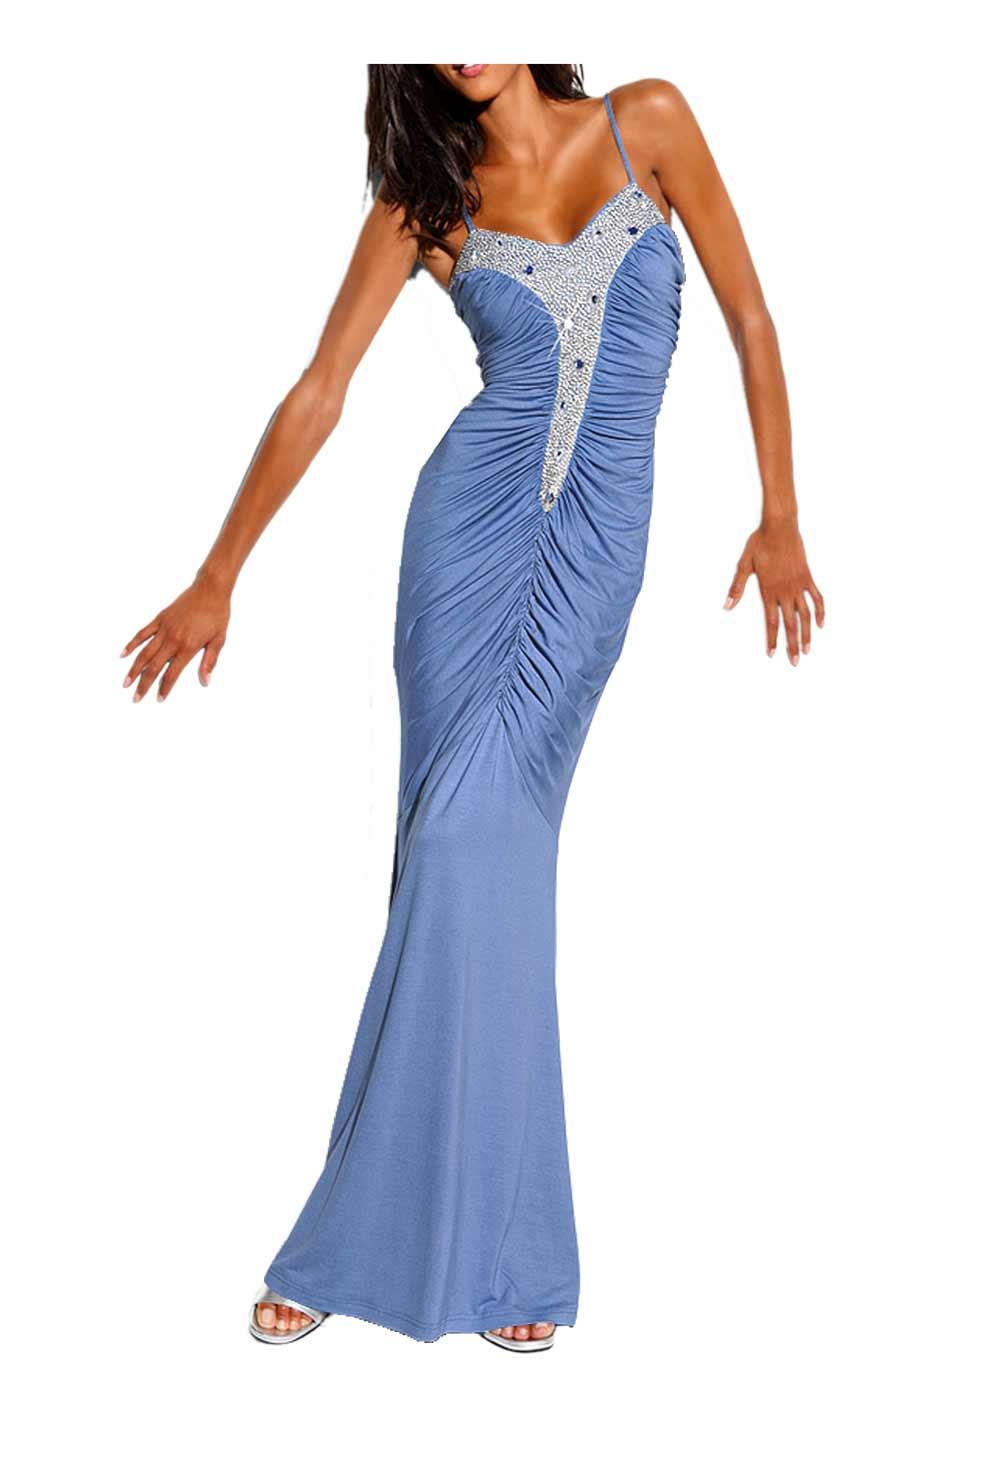 Festmoden Carry Allen by Ella Singh Abendkleid lang, blau 067.894 067.894 Missforty